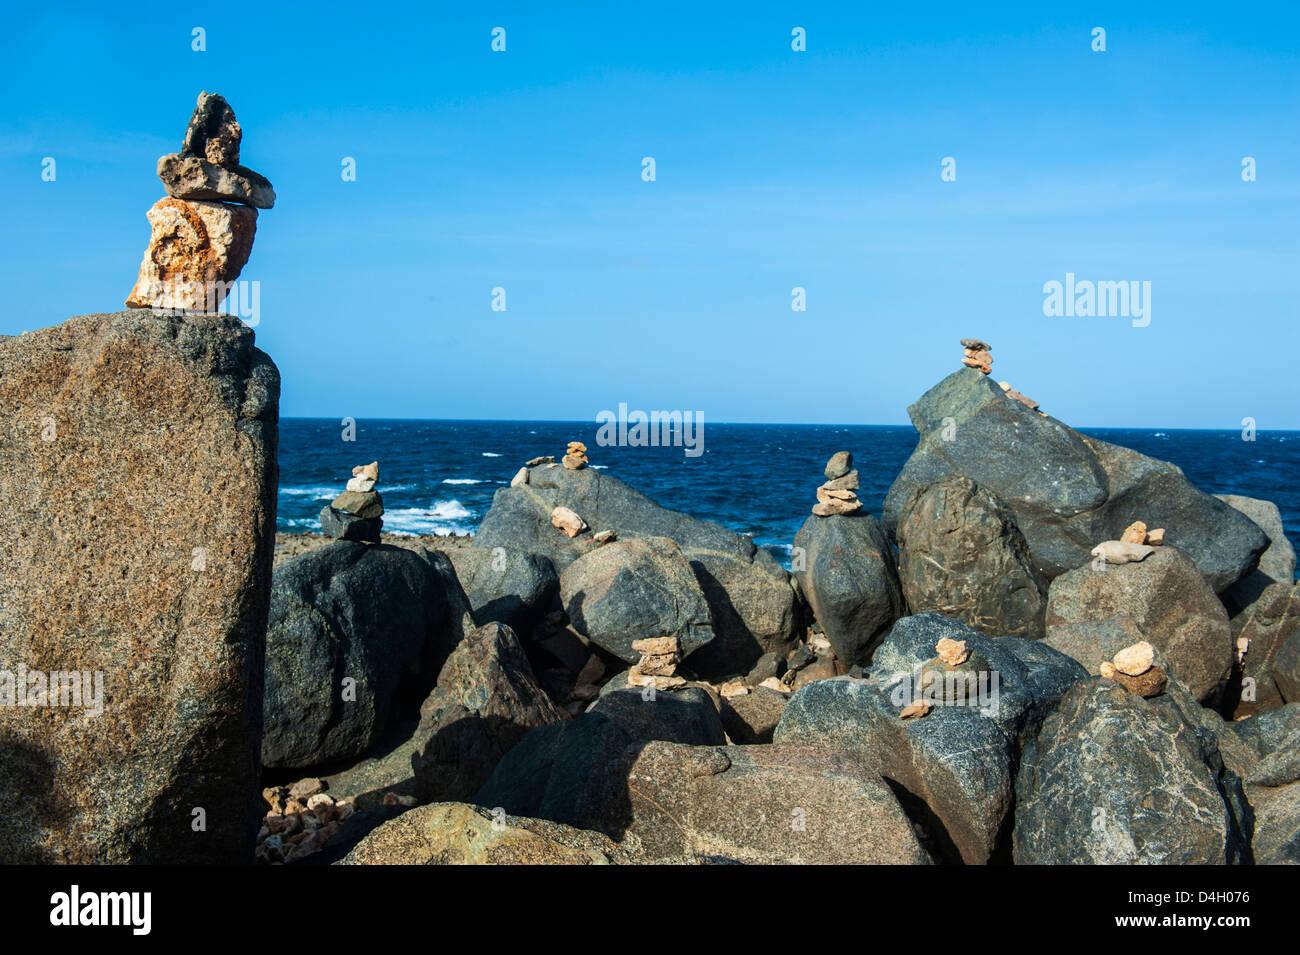 Stone set up on shore, Aruba, ABC Islands, Netherlands Antilles, Caribbean - Stock Image